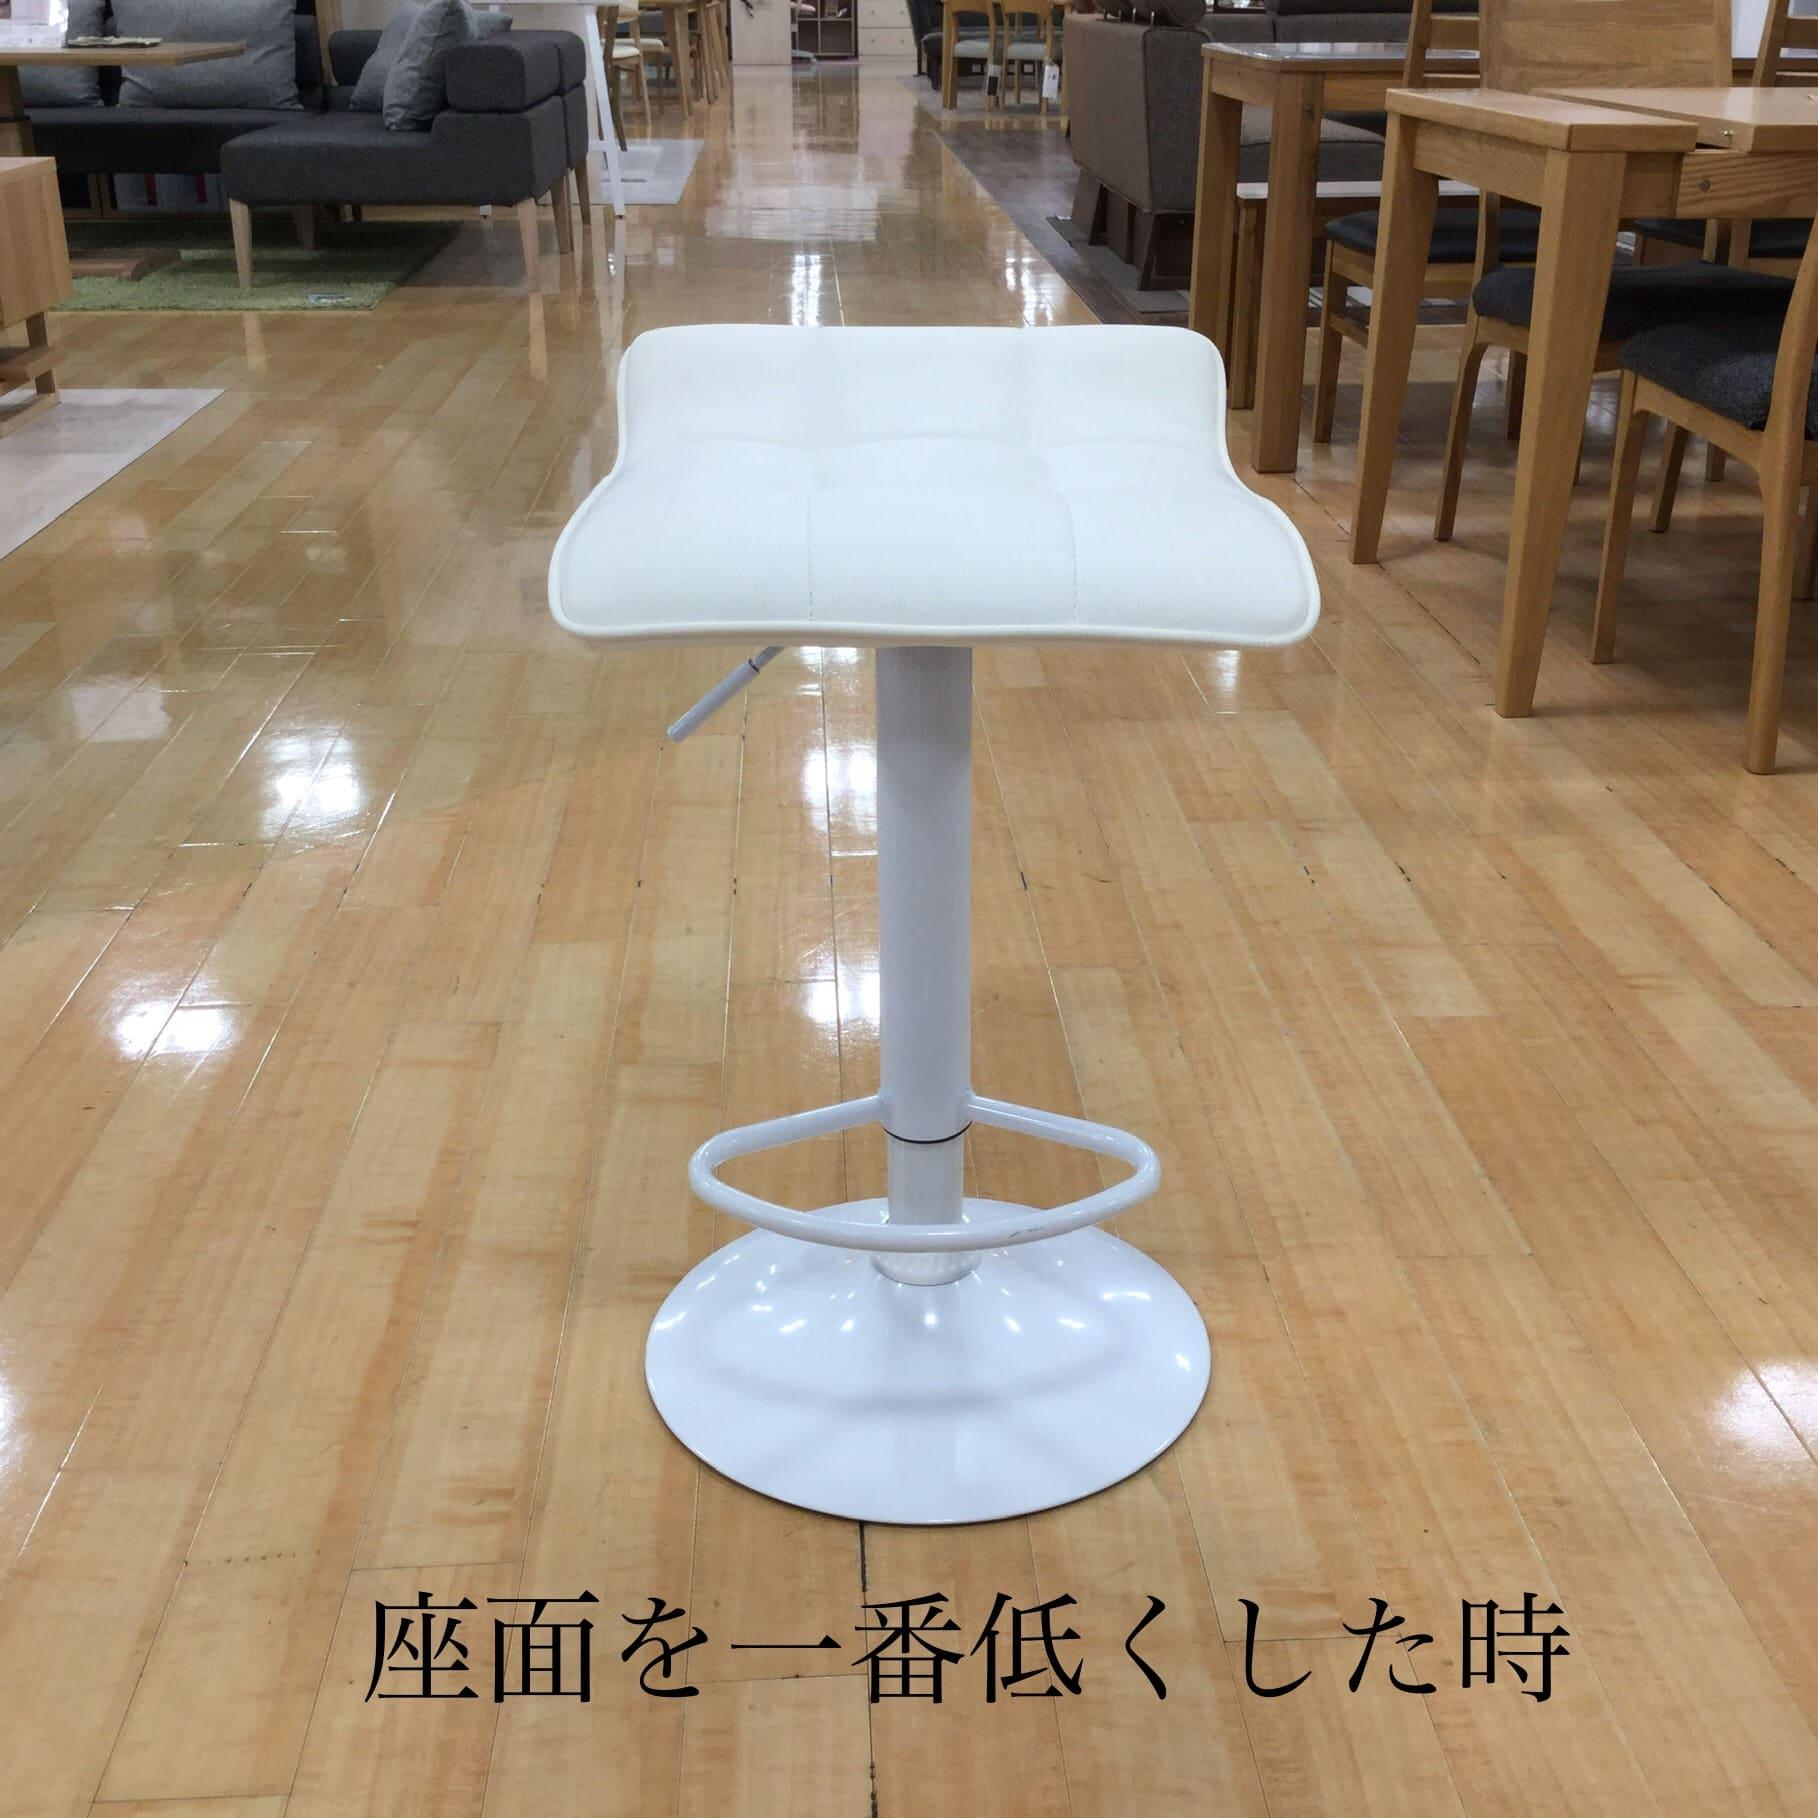 【葛西店 展示特価品】 バーチェアー TCC-601